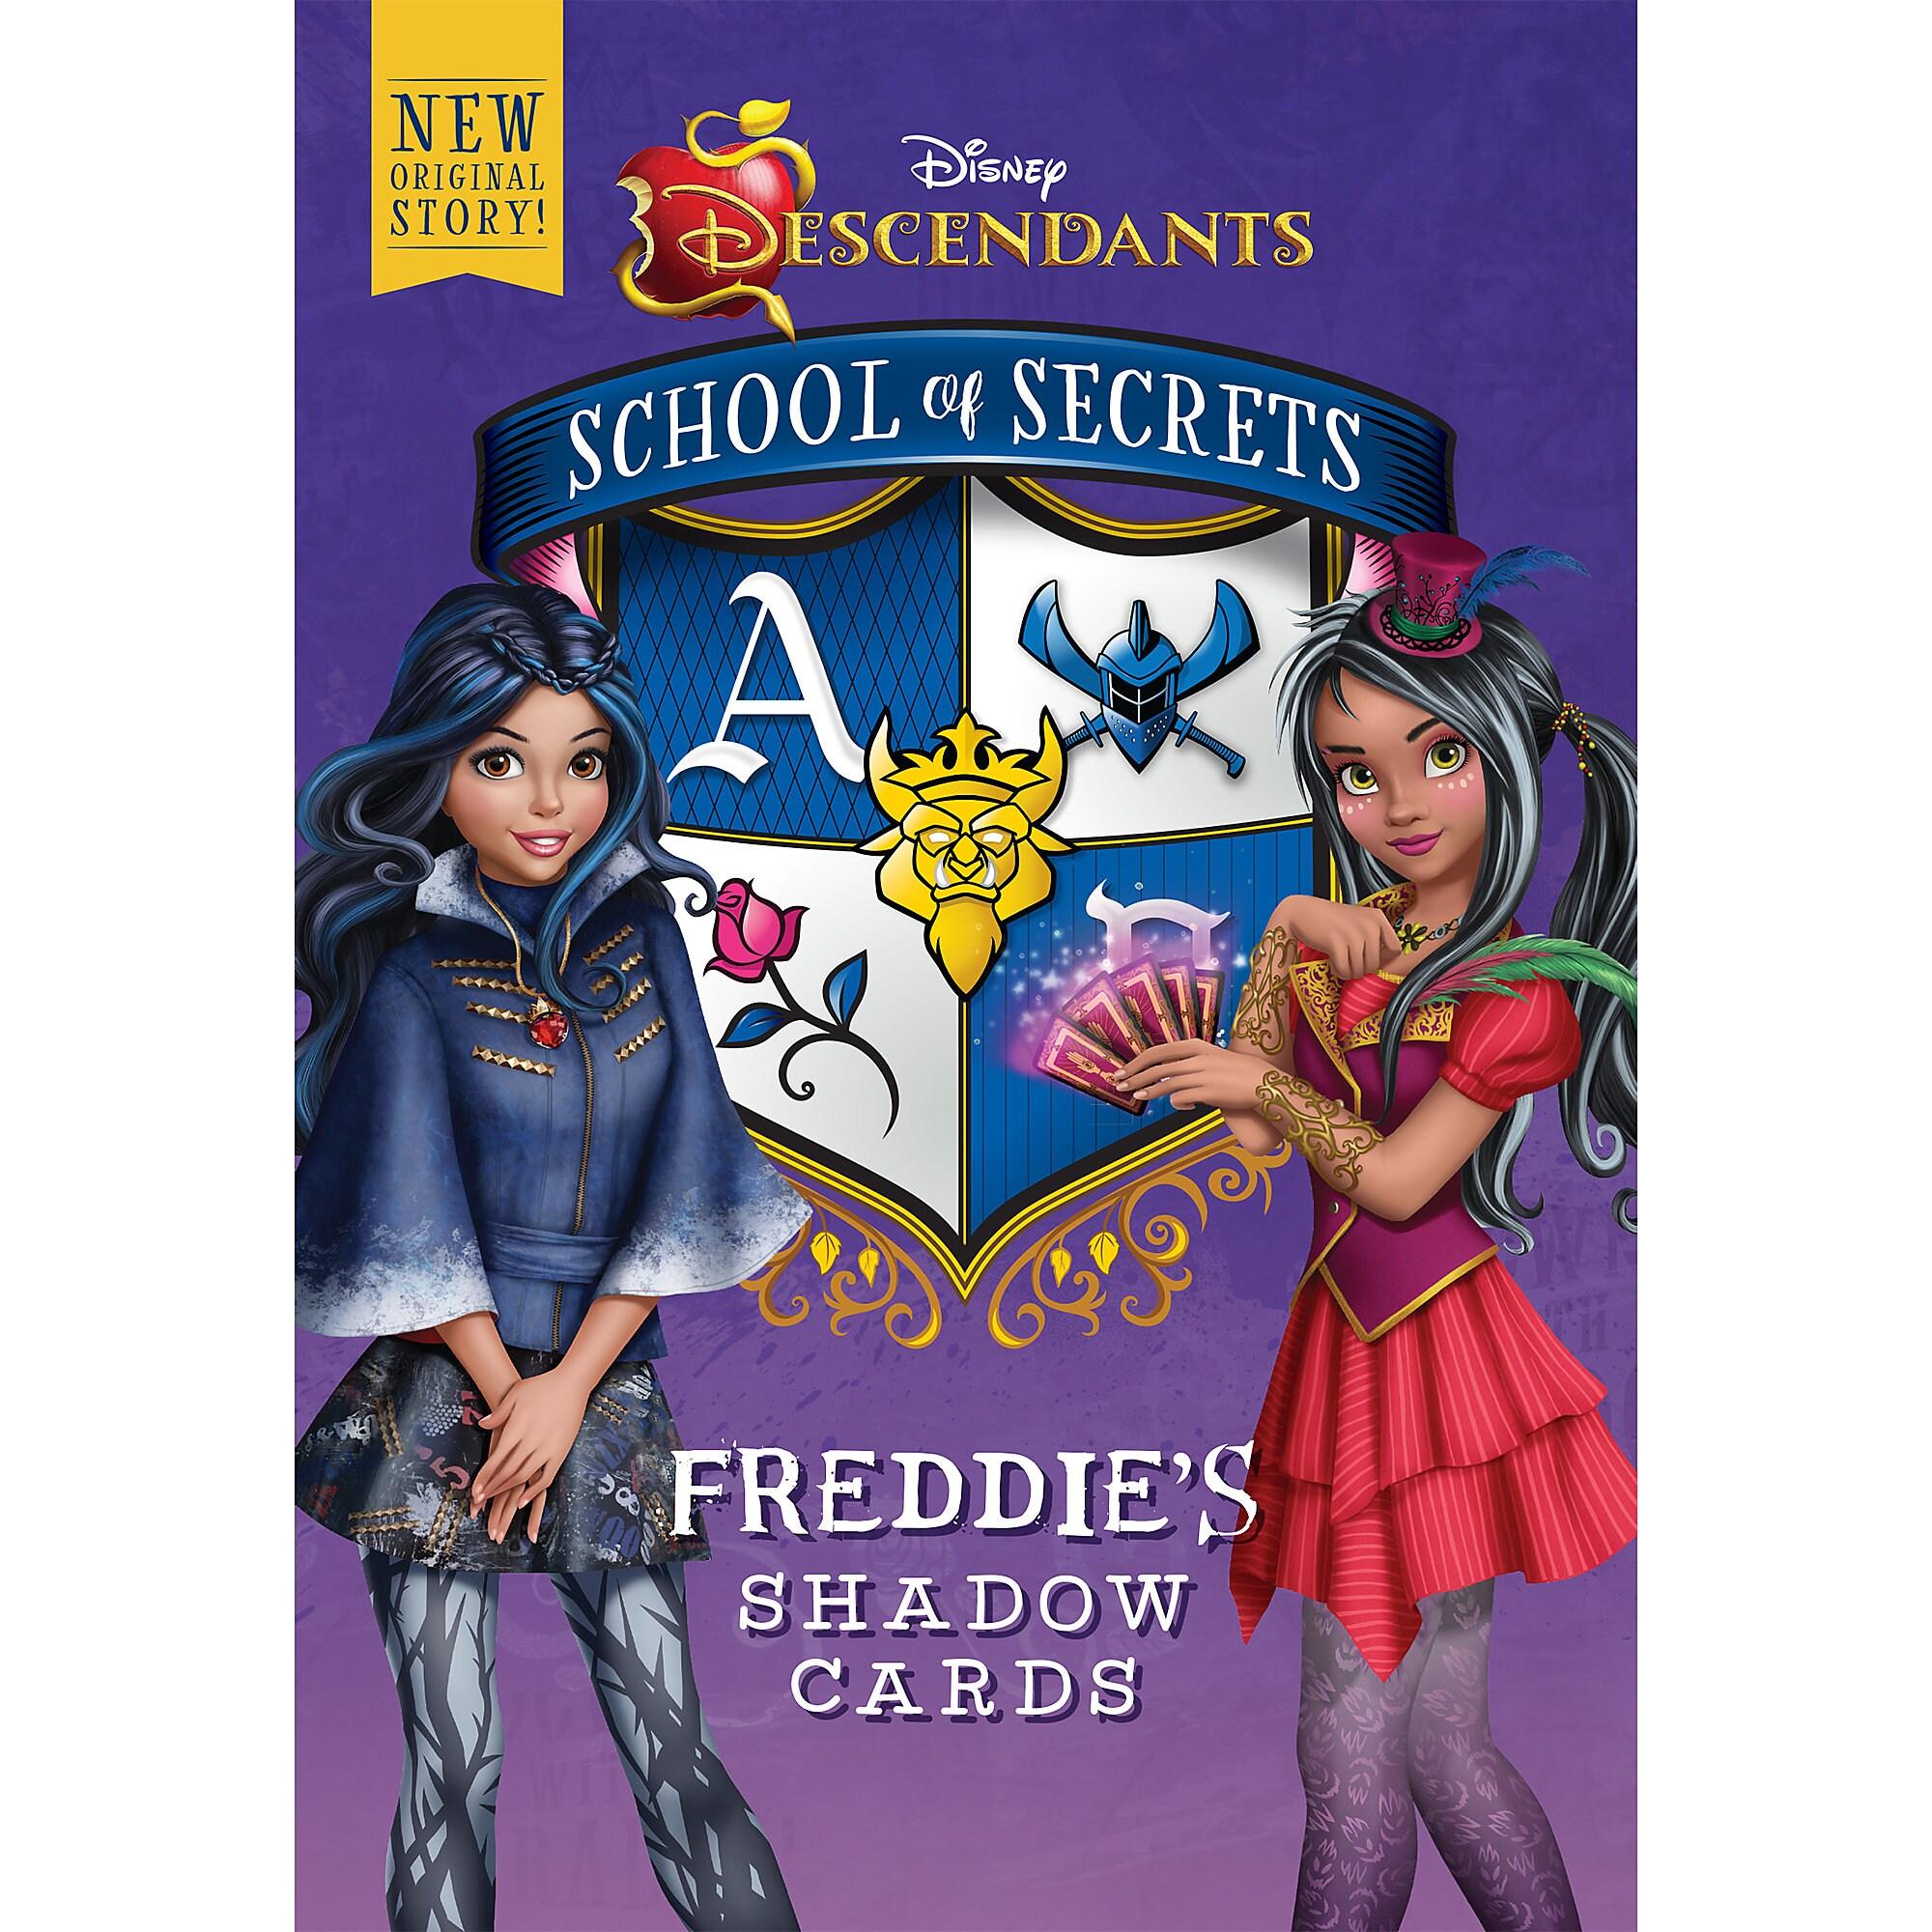 Descendants School of Secrets: Freddie's Shadow Cards